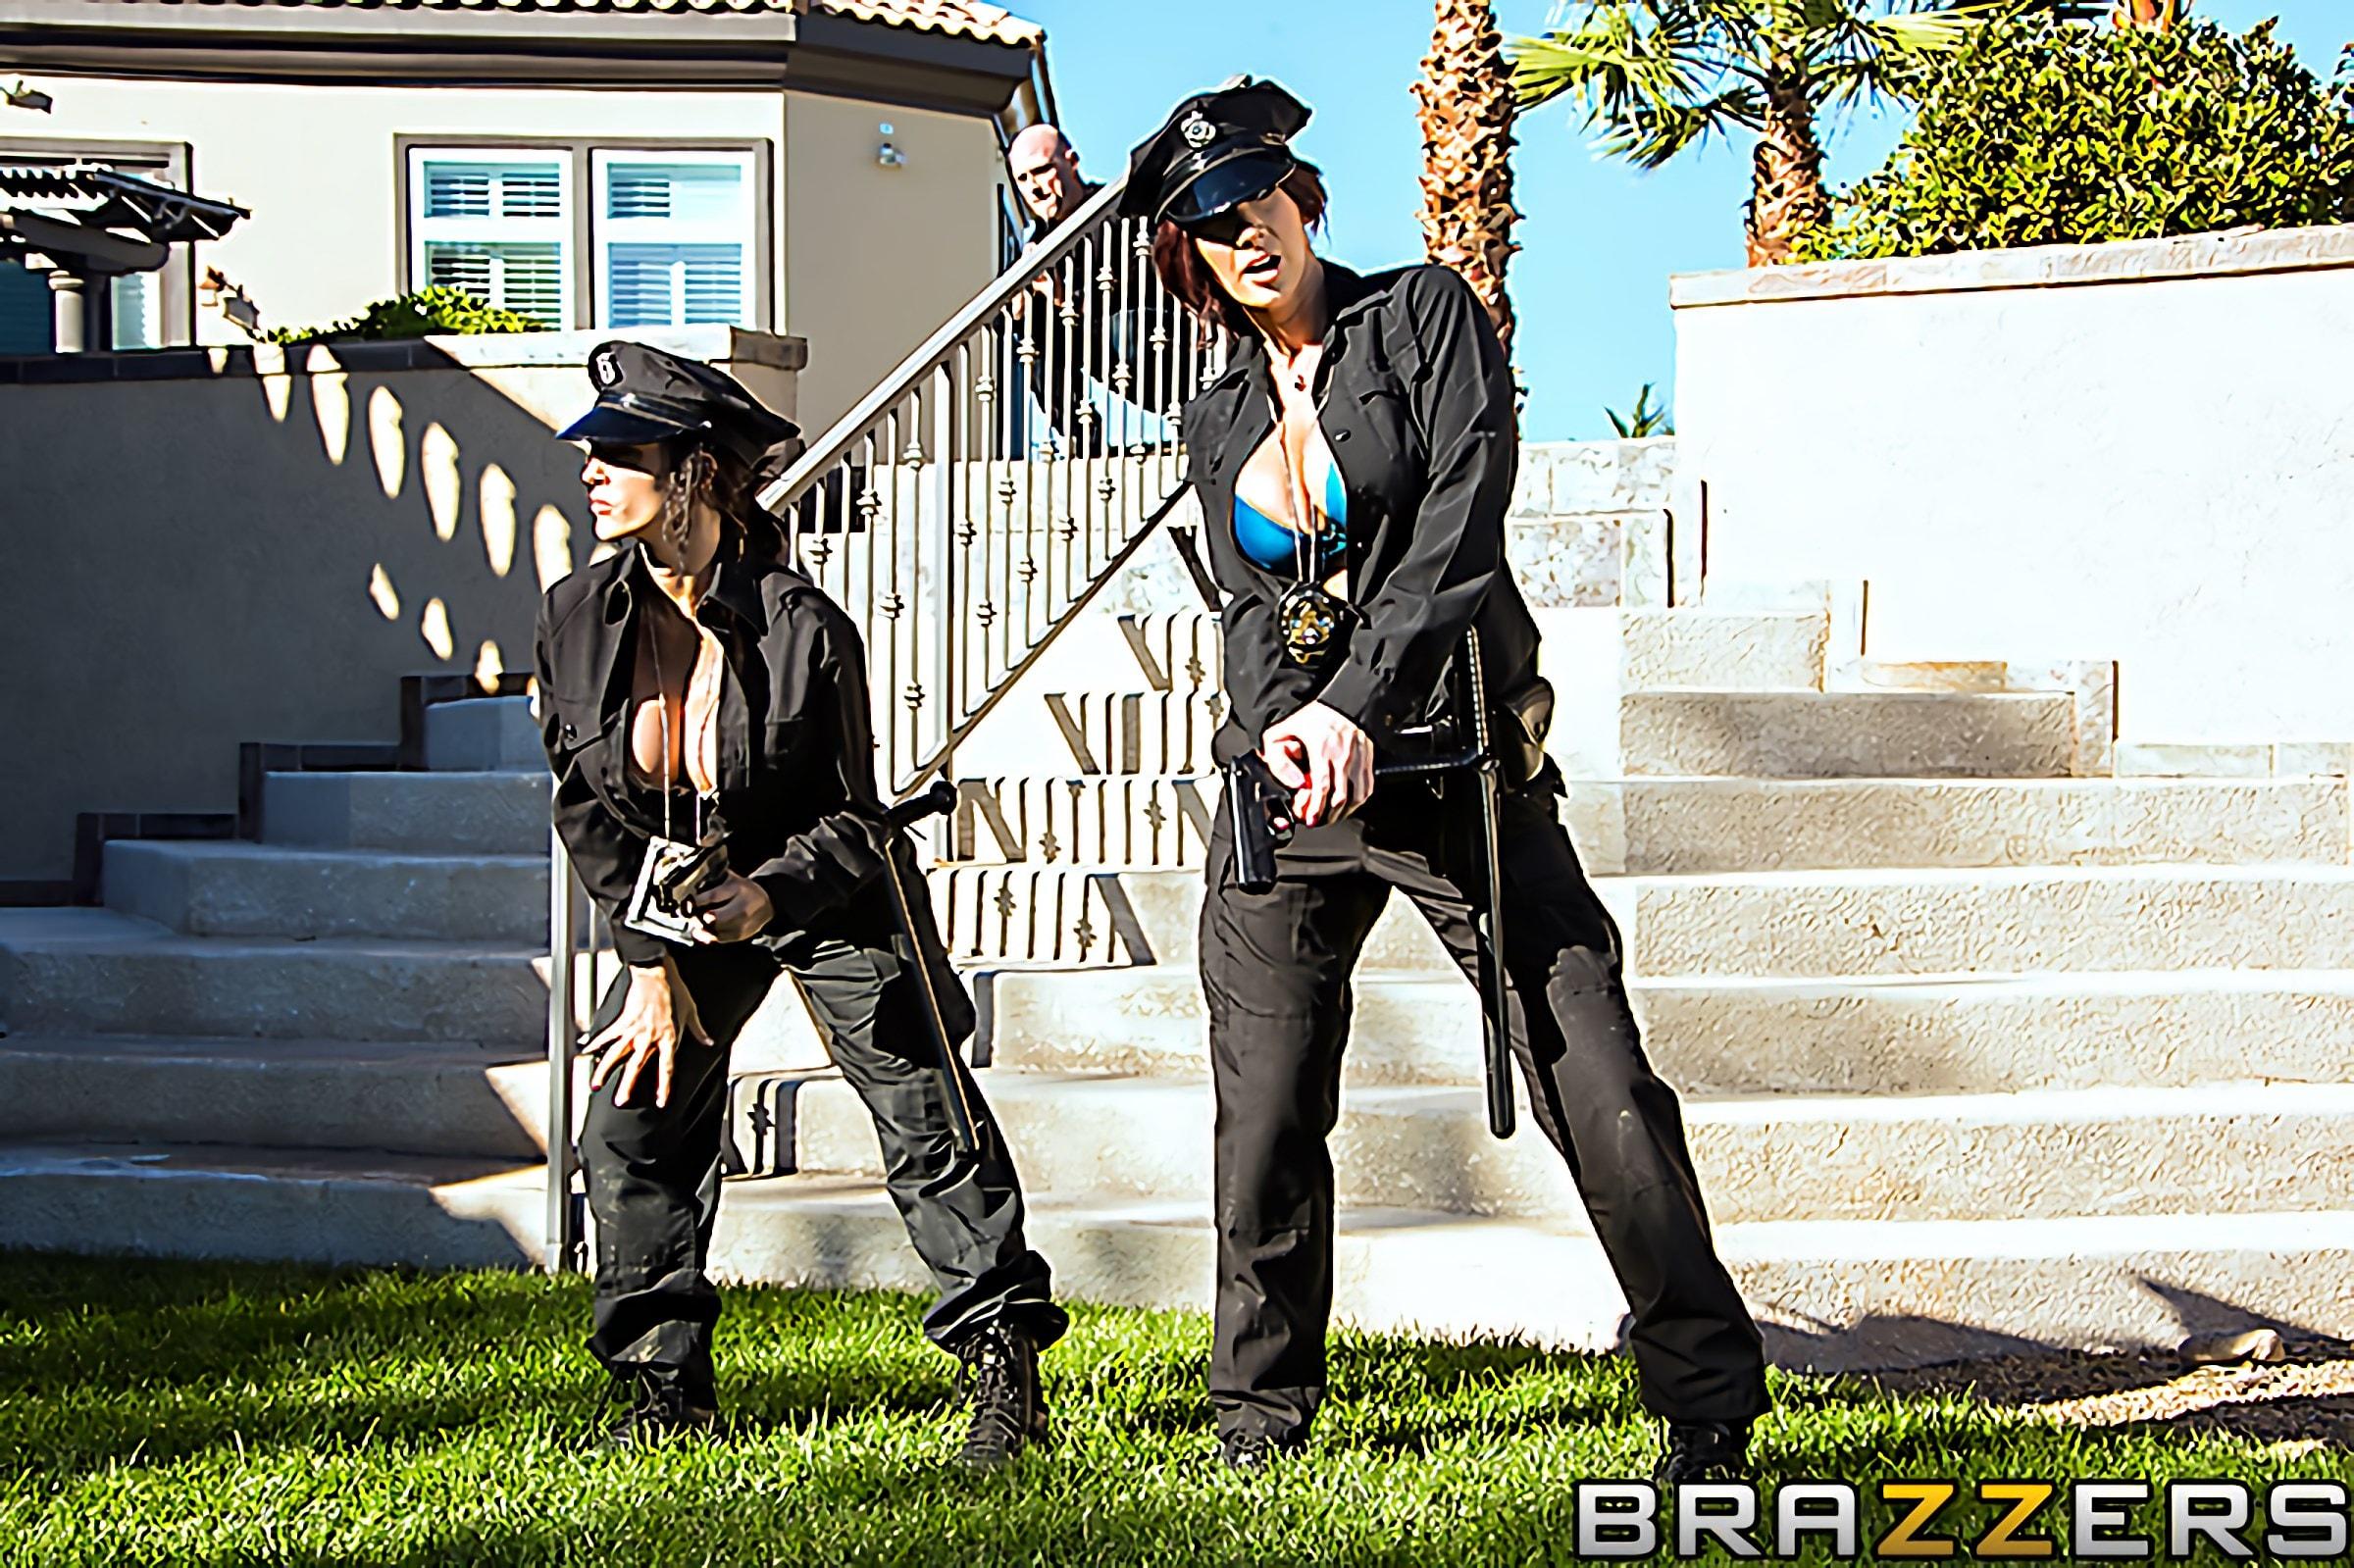 Brazzers 'Enhanced Interrogation' starring Jayden Jaymes (Photo 1)